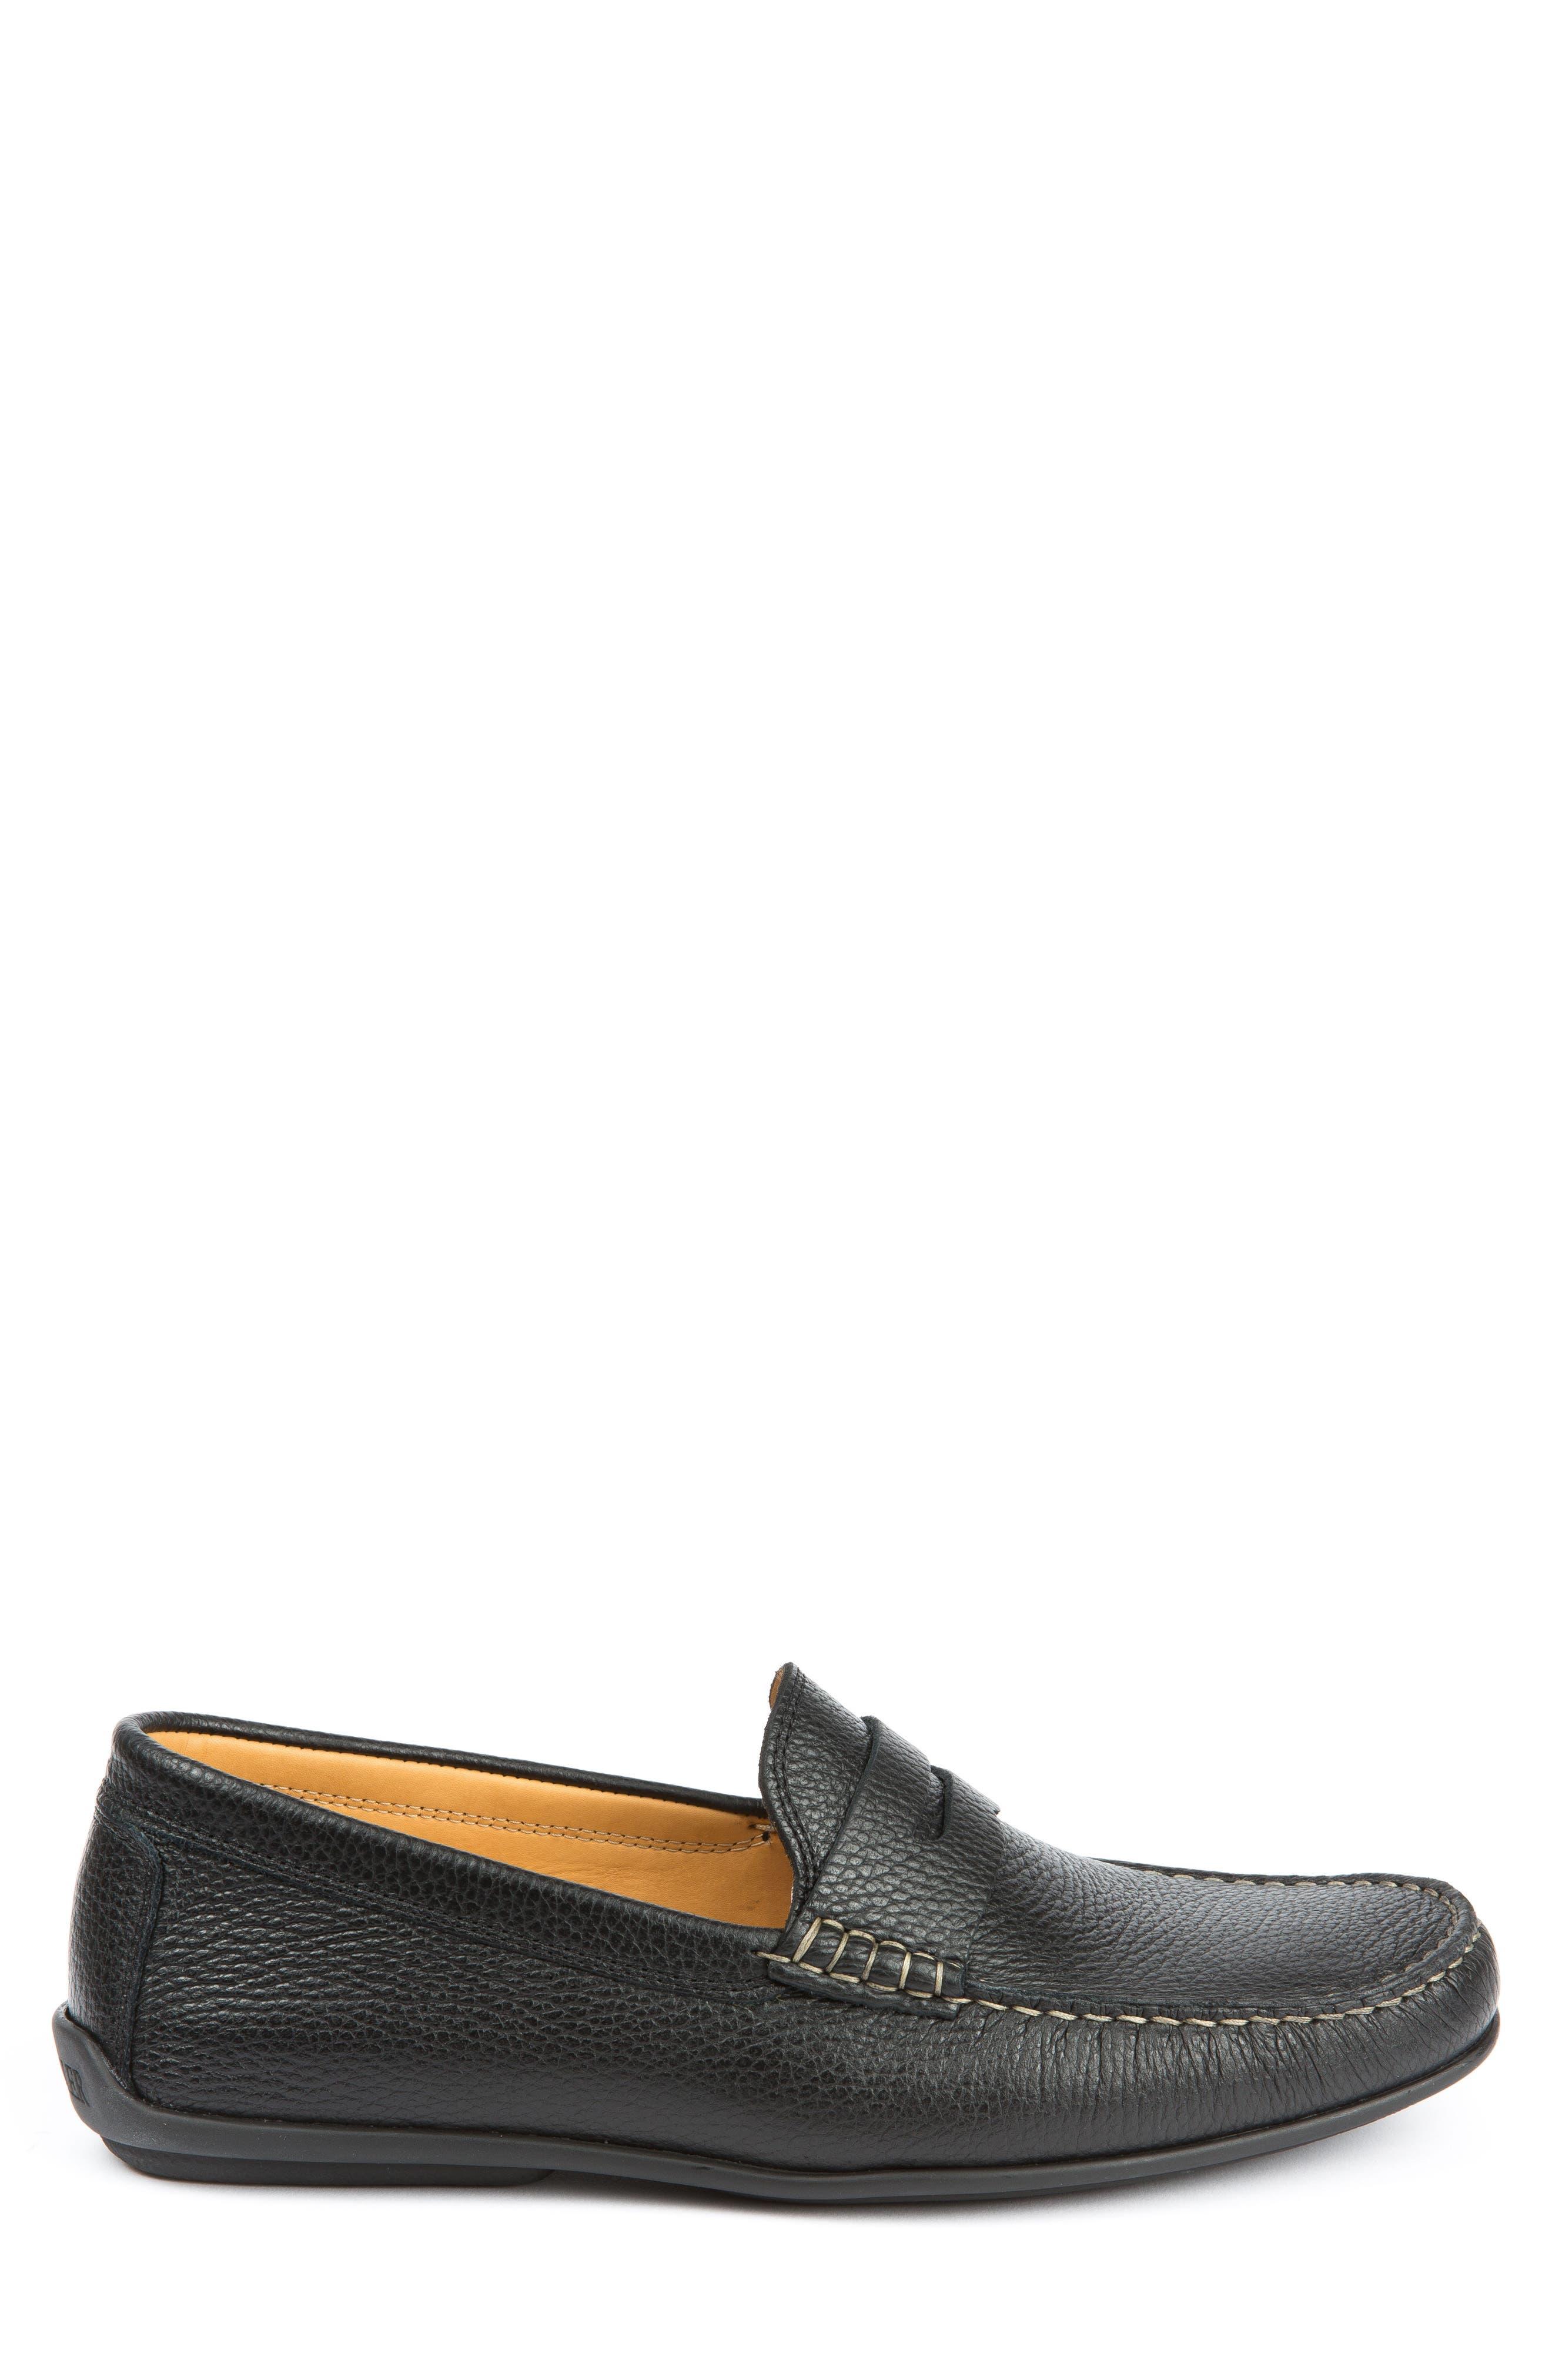 Hudsons Driving Shoe,                             Alternate thumbnail 3, color,                             Black Grain